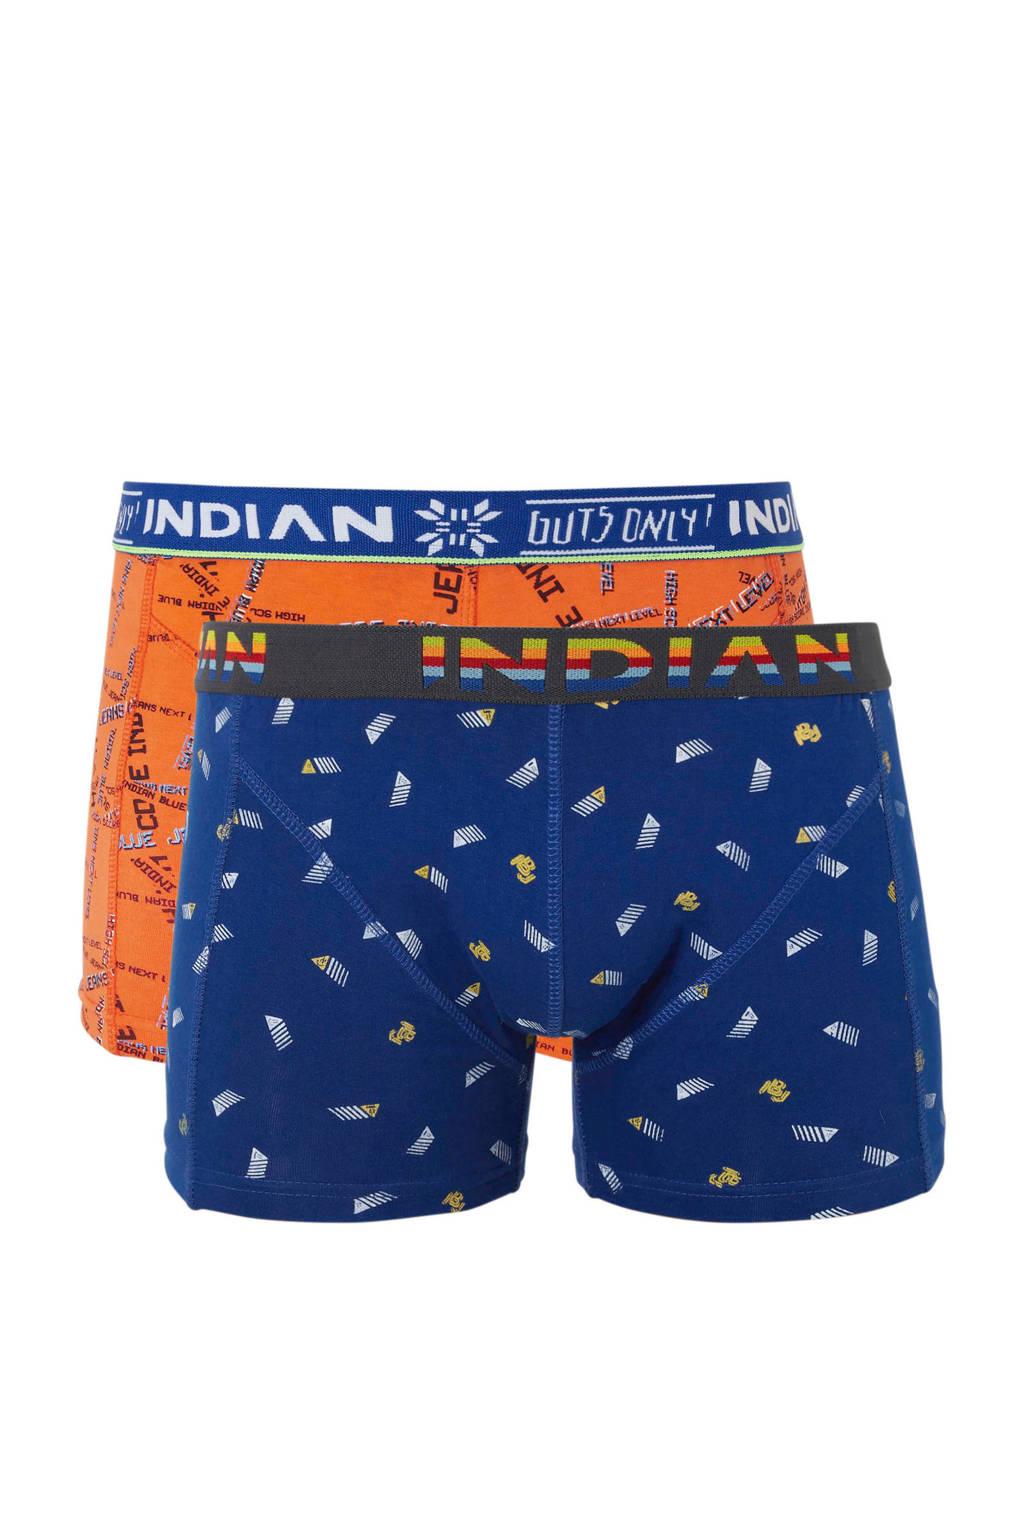 Indian Blue Jeans   boxershort - set van 2, Neon oranje/ kobaltblauw